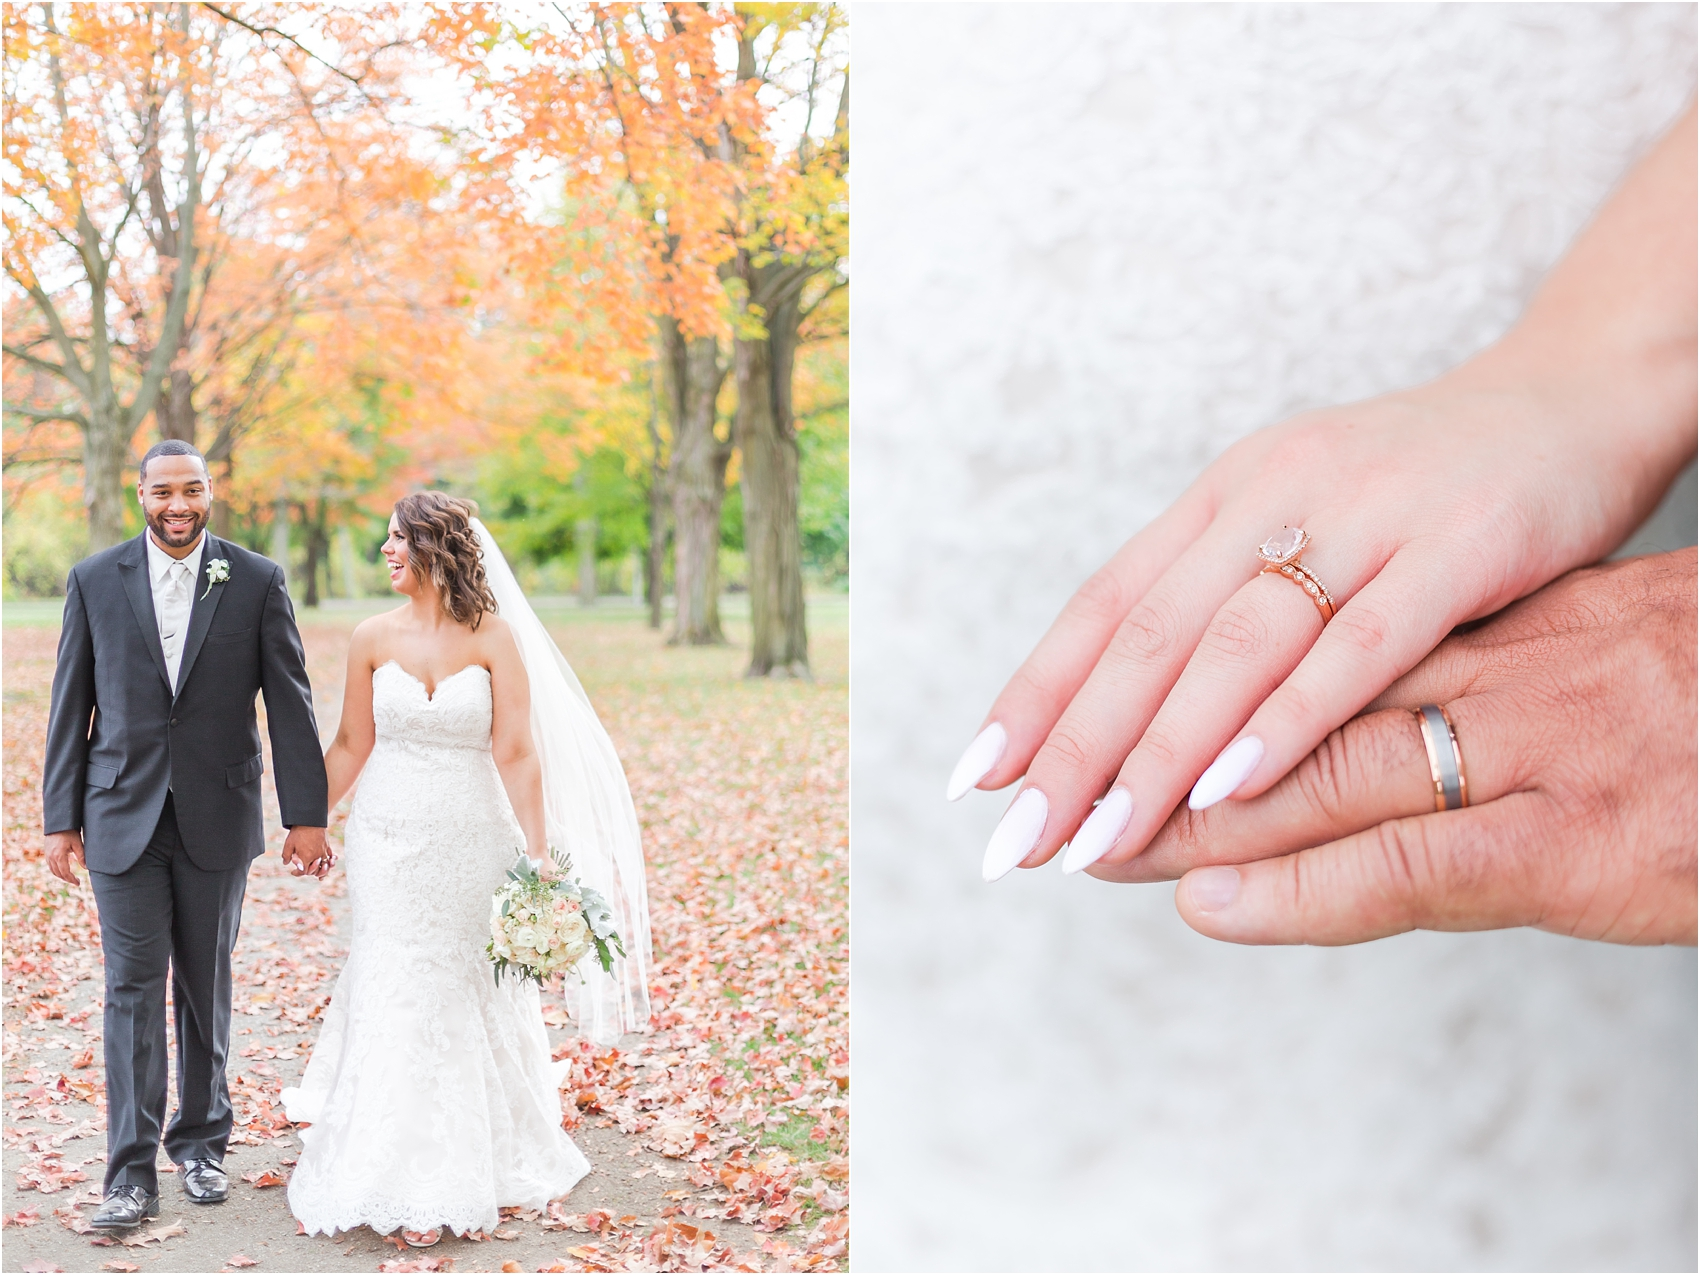 elegant-and-romantic-fall-wedding-photos-at-st-marys-catholic-church-in-monroe-michigan-by-courtney-carolyn-photography_0034.jpg